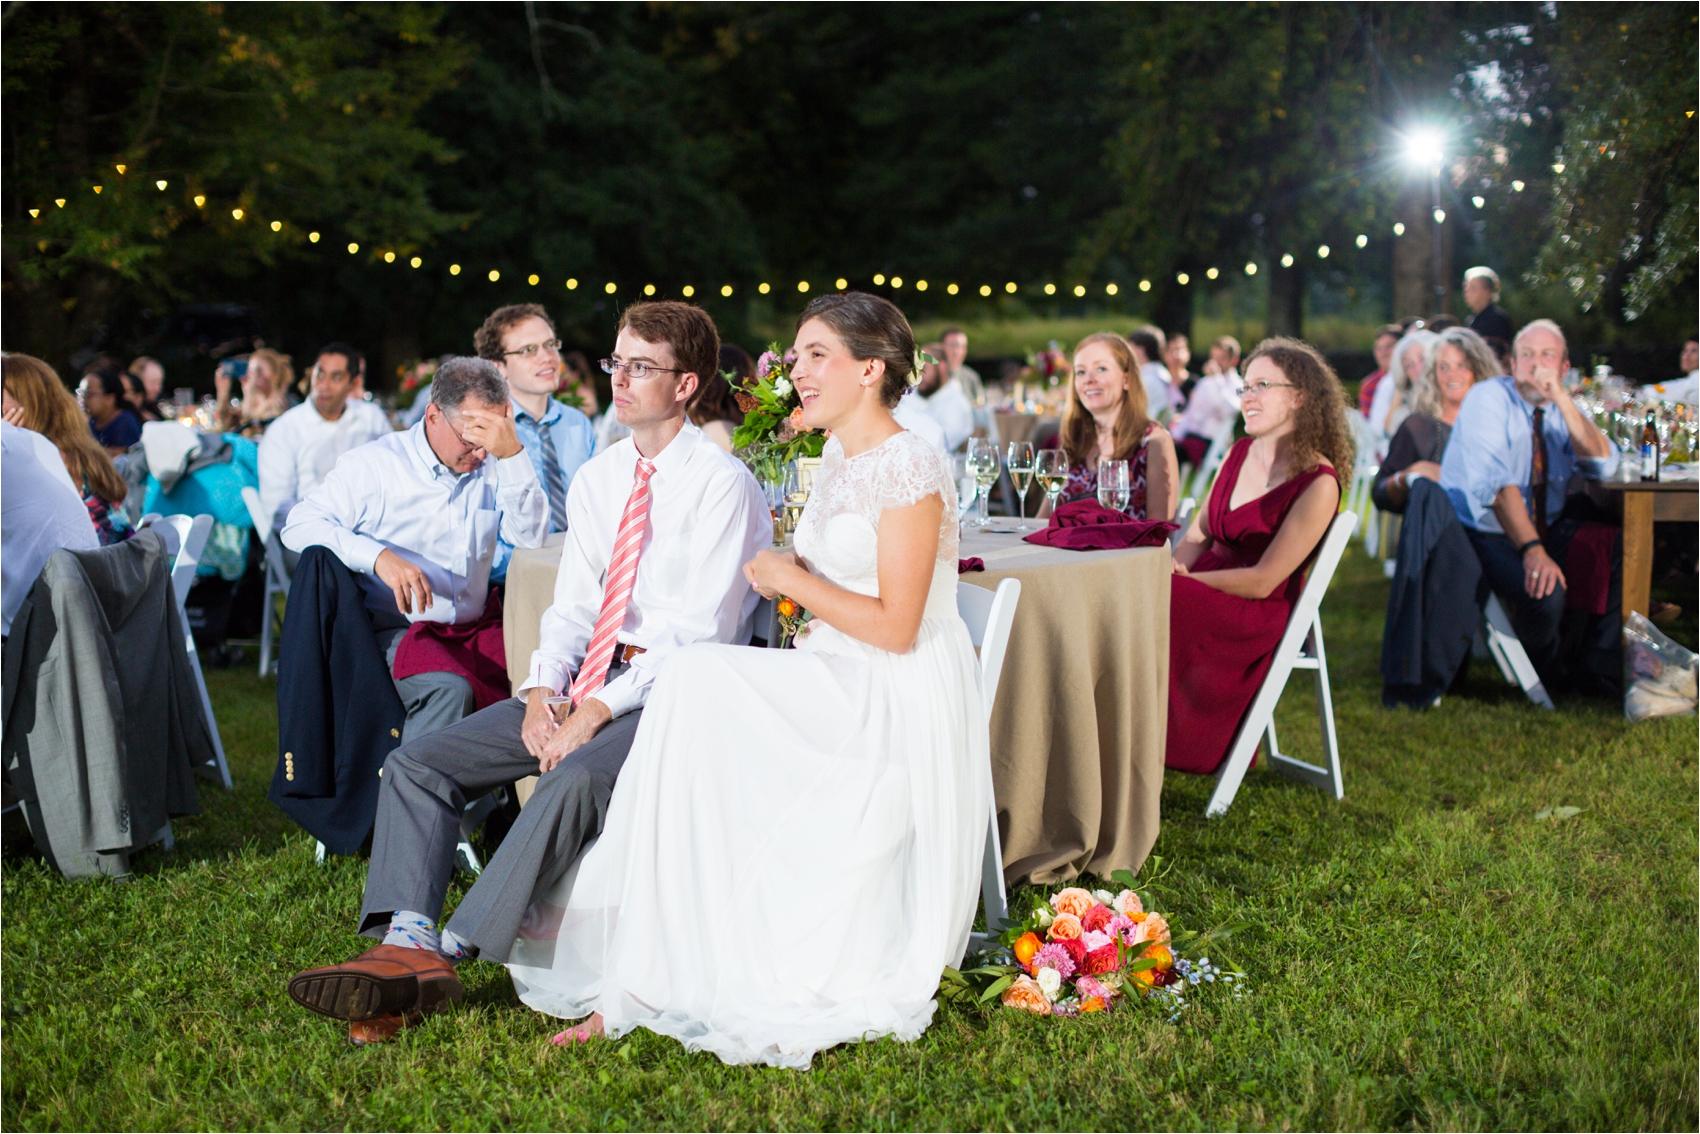 Feather-and-Oak-Rainforest-Trust-Virginia-Wedding-0053.jpg